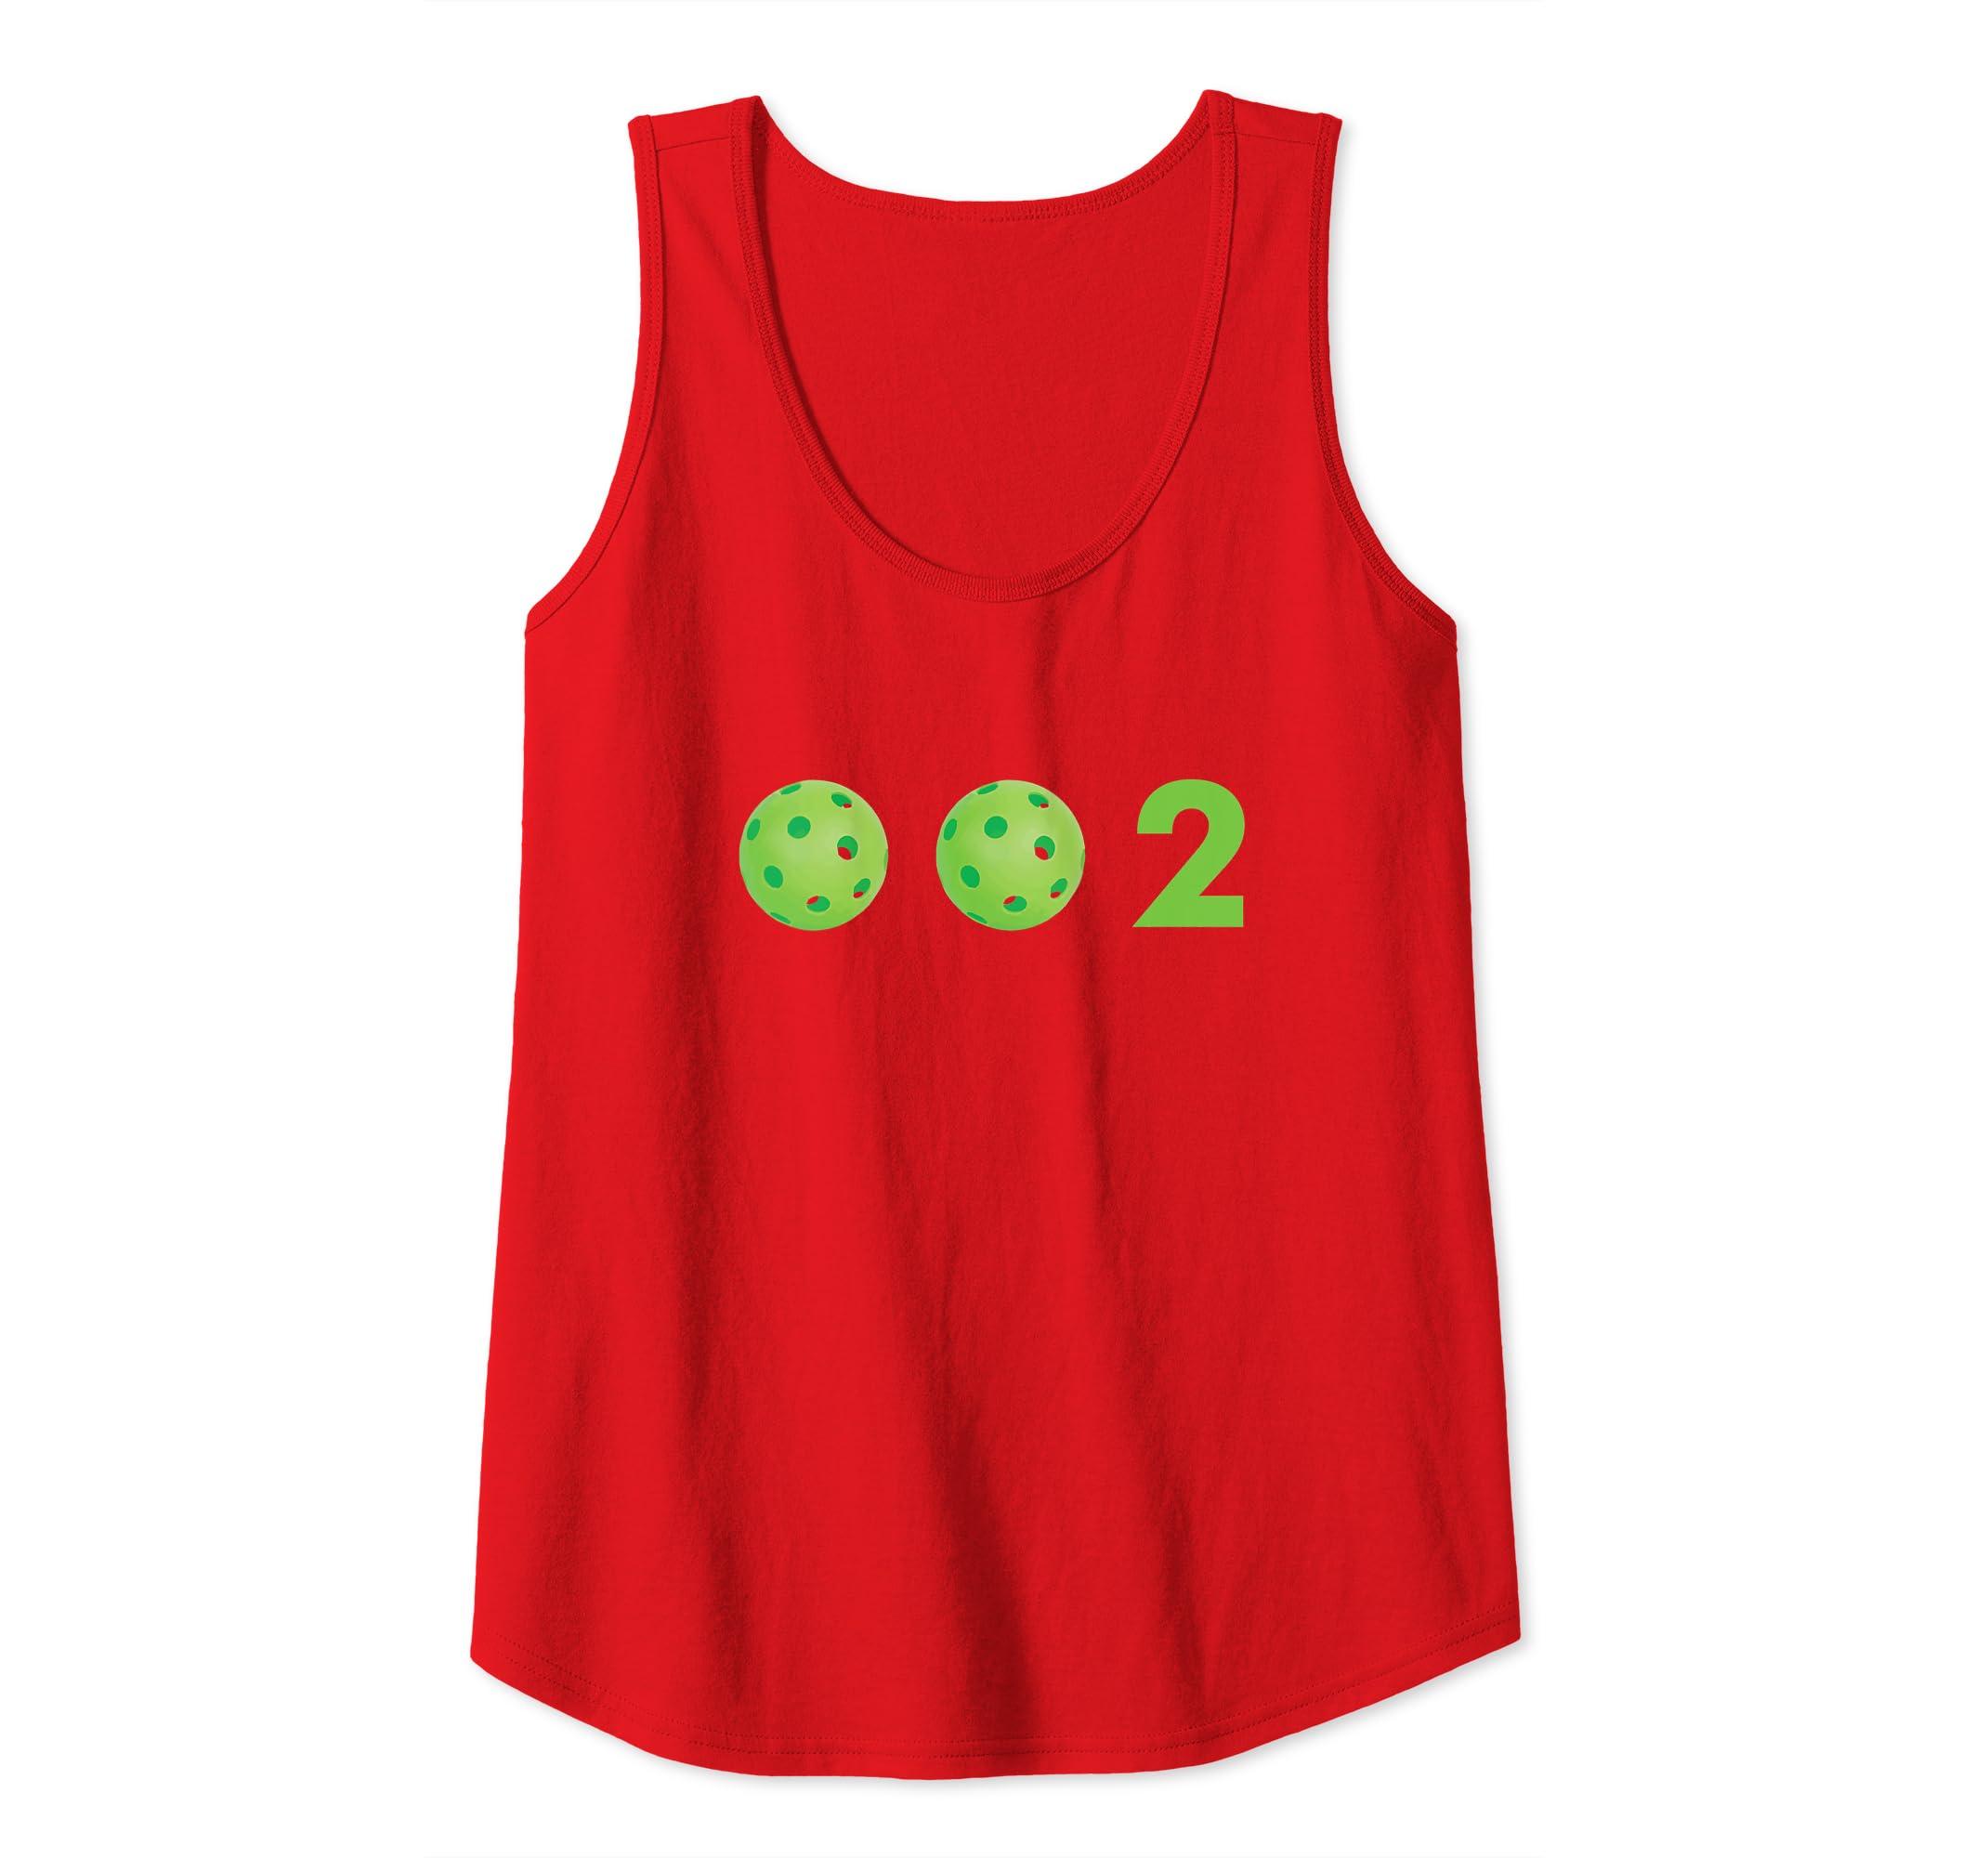 295b145b9 Amazon.com: Zero, Zero, Two - 0, 0, 2 Cute Funny Pickleball Apparel Tank  Top: Clothing